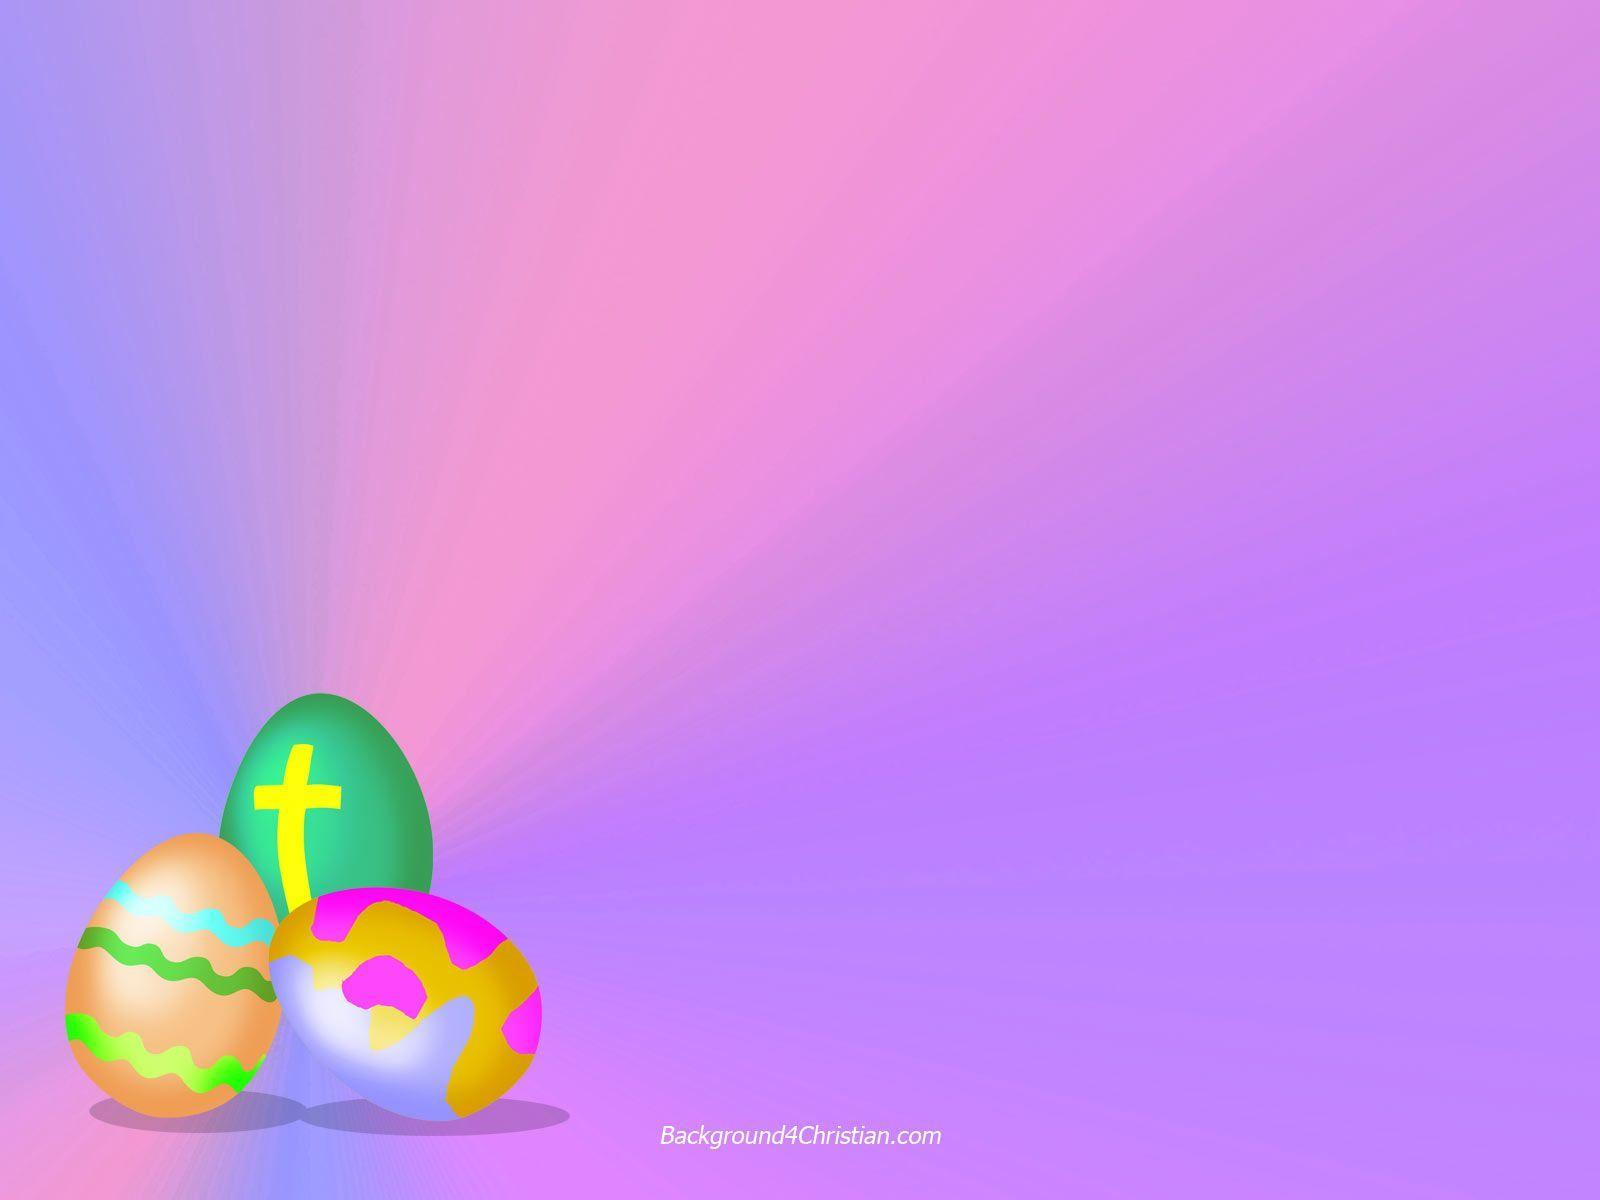 Free Easter Desktop Wallpaper Backgrounds Wallpaper Cave